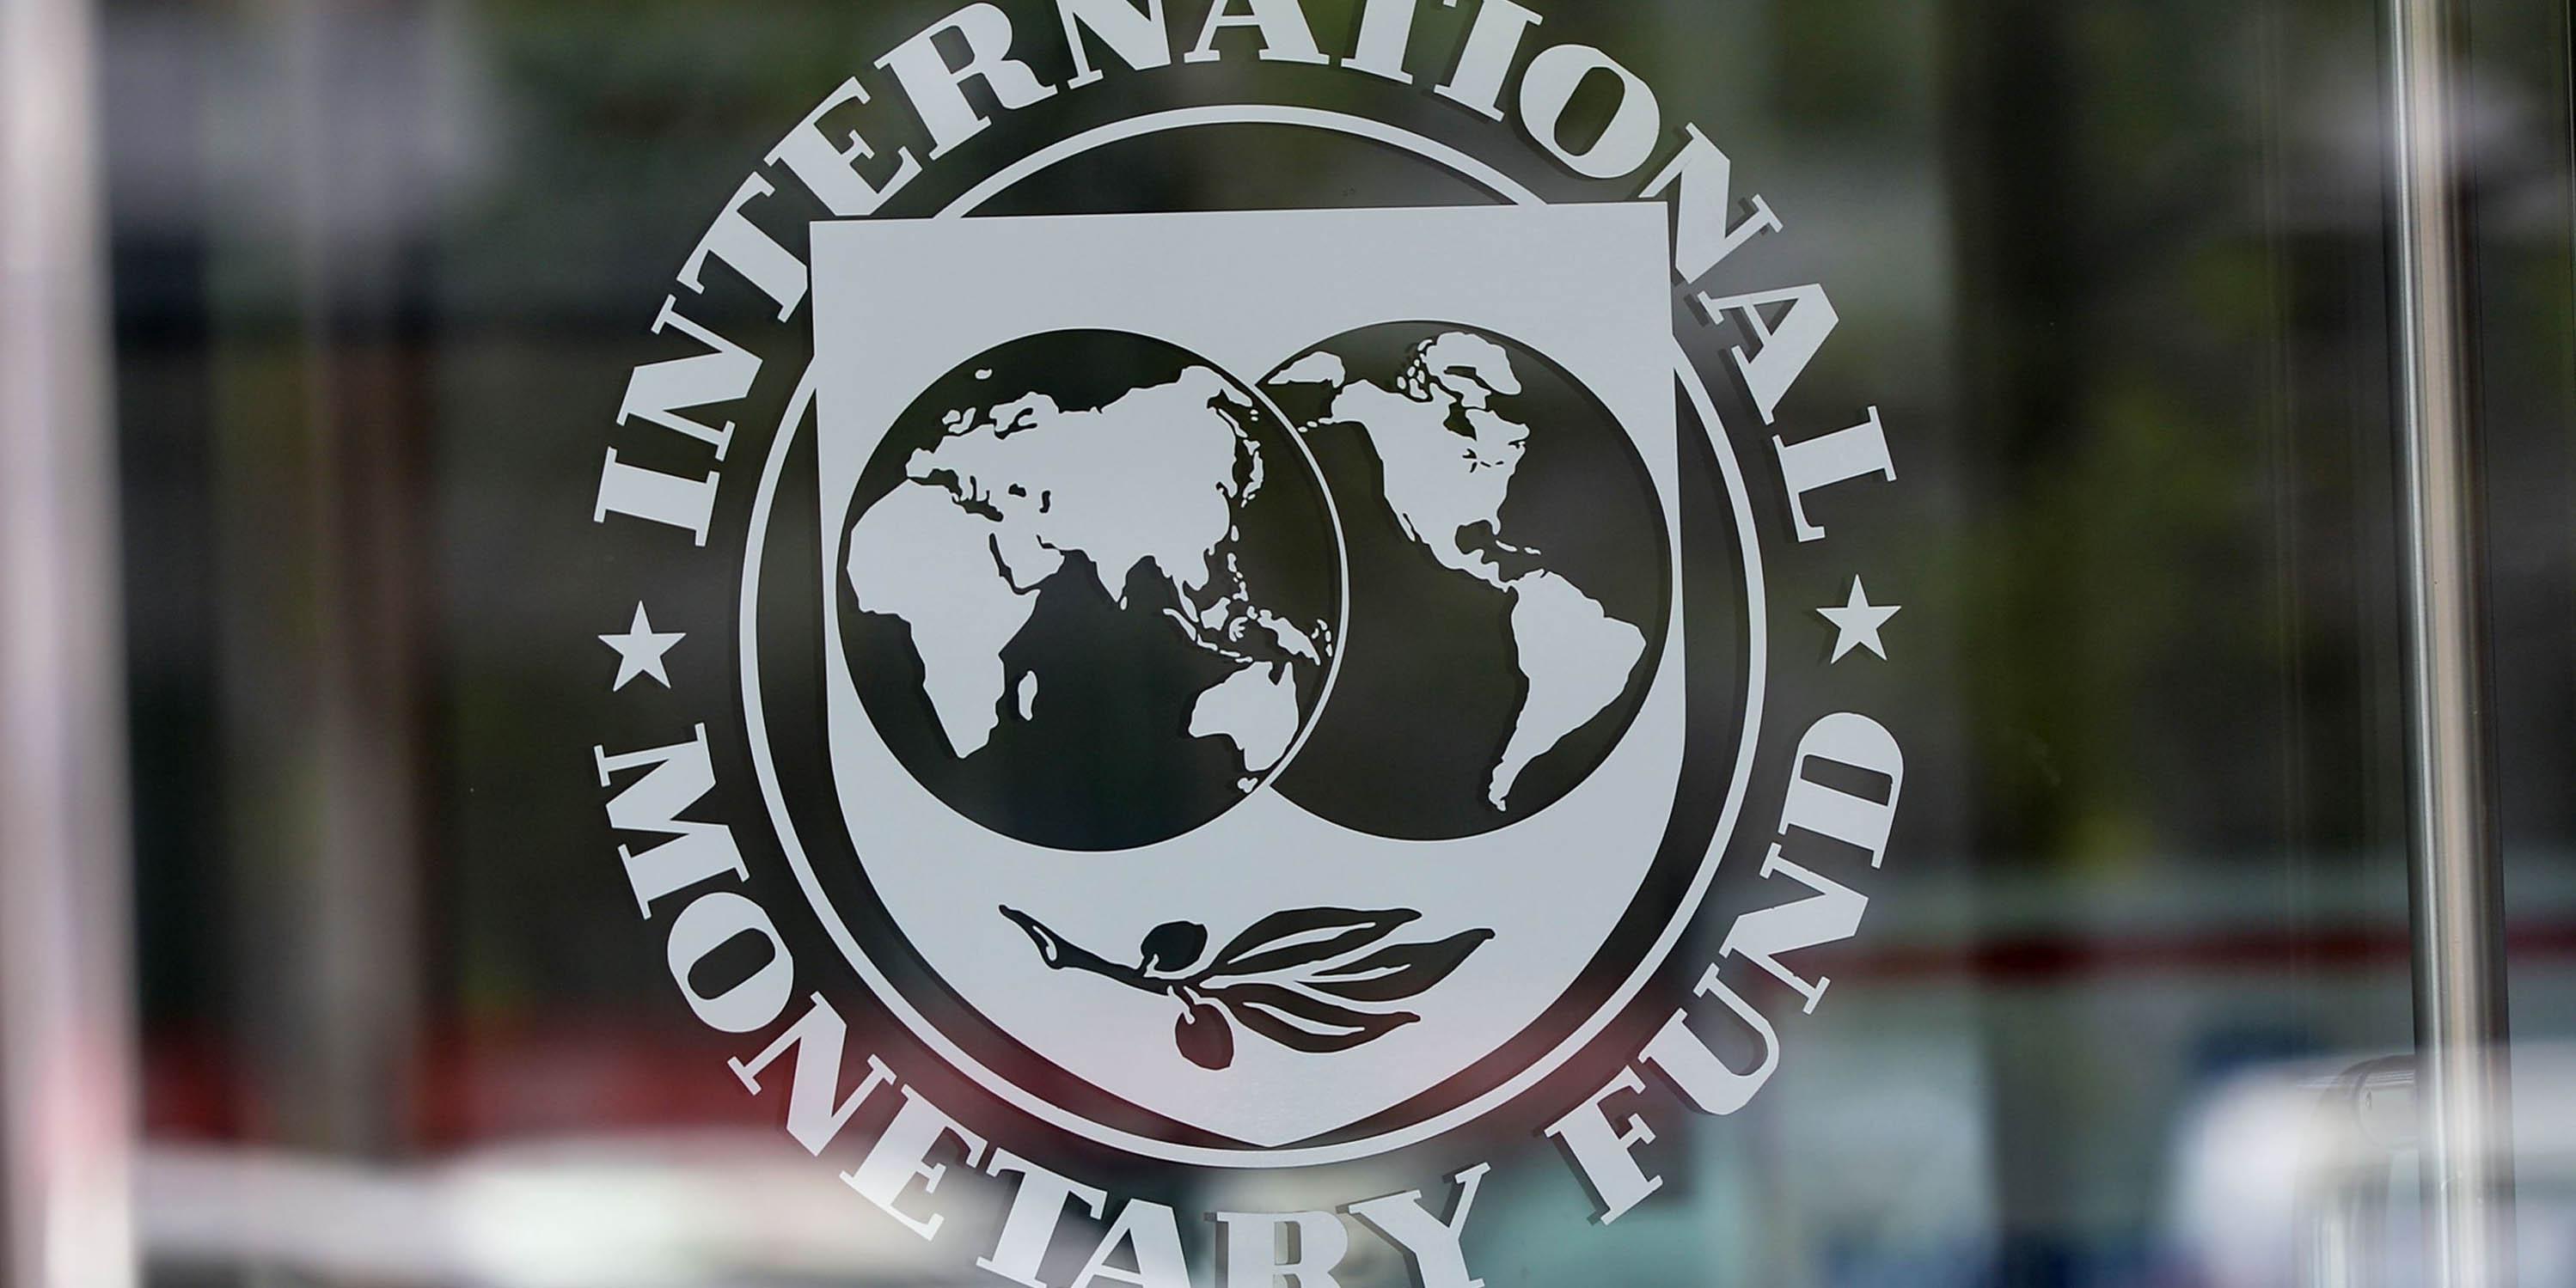 دیدهبانی صندوق بینالمللی پول